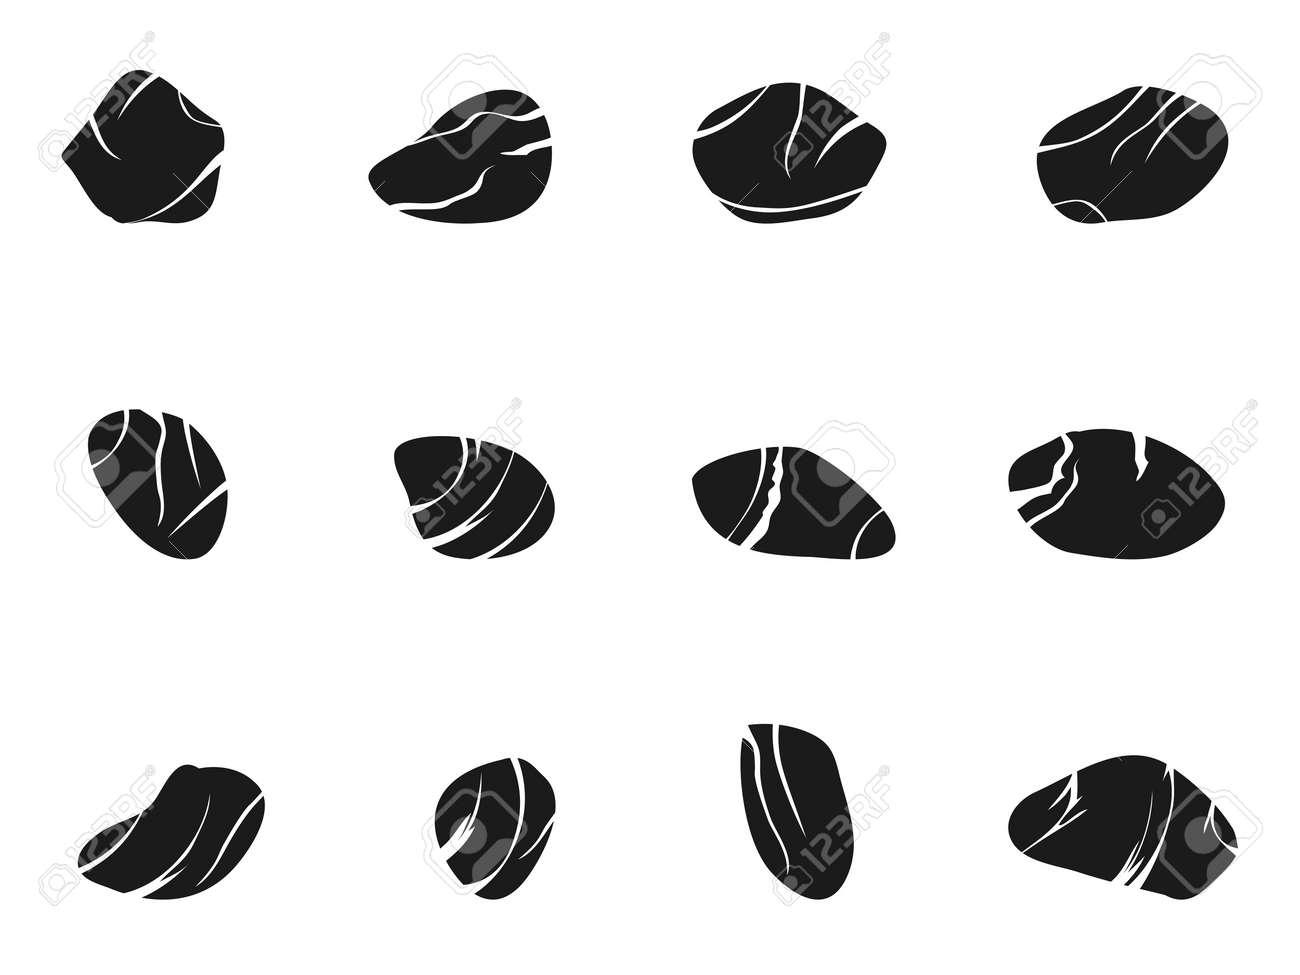 isolated black stone icons set from white background - 31634412